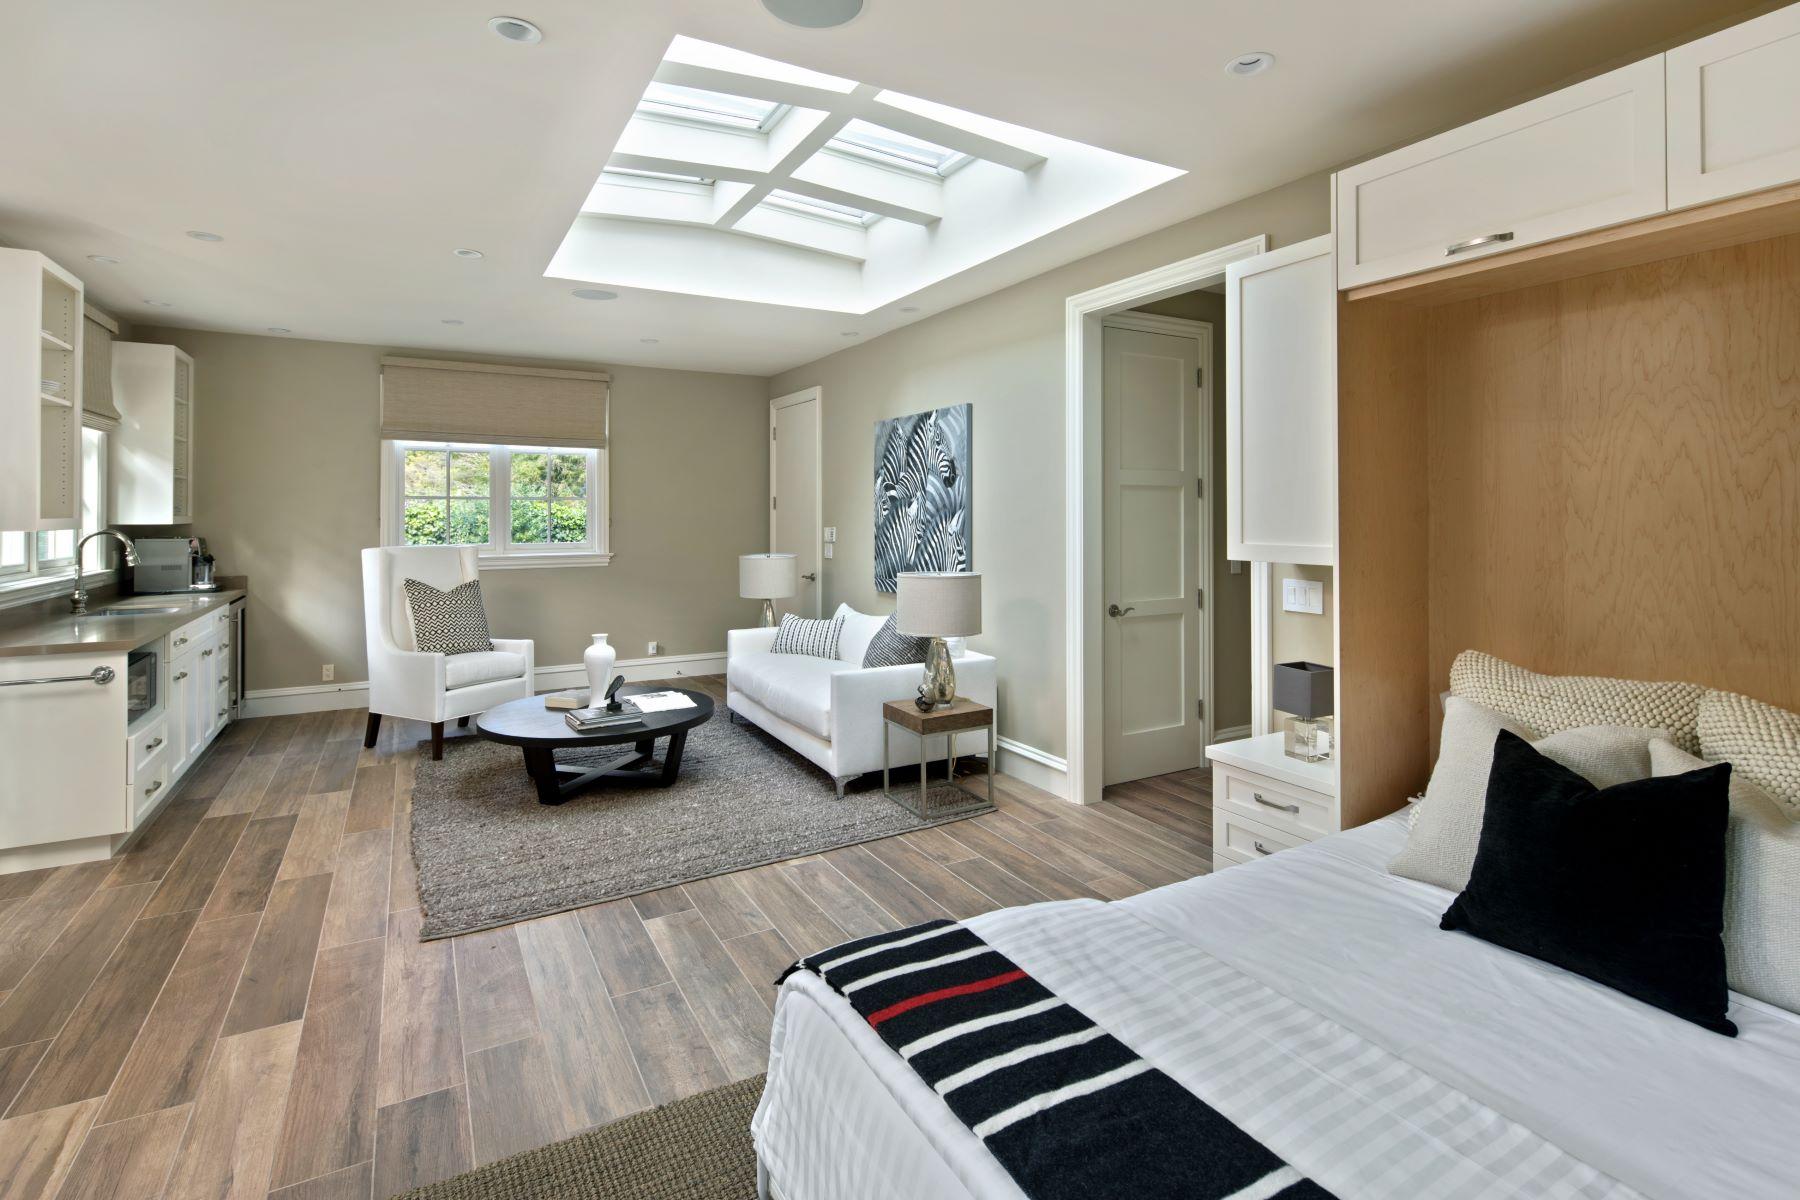 Additional photo for property listing at 83 Tuscaloosa Ave  Atherton, California 94027 United States